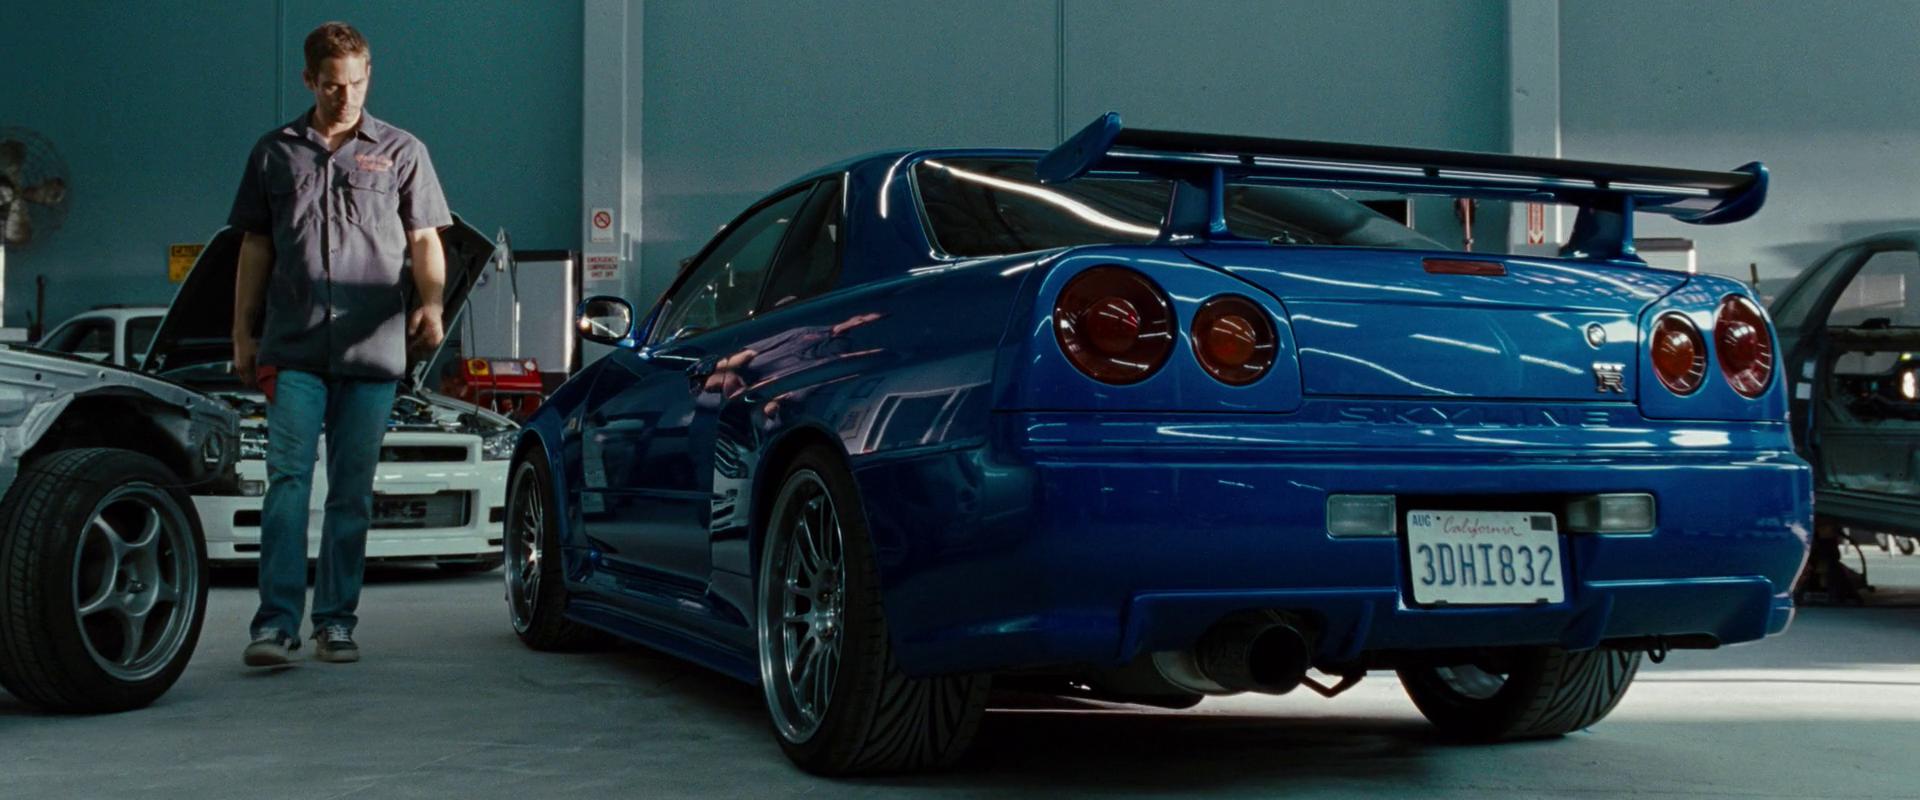 2002 Nissan Skyline GTR R34 01.png